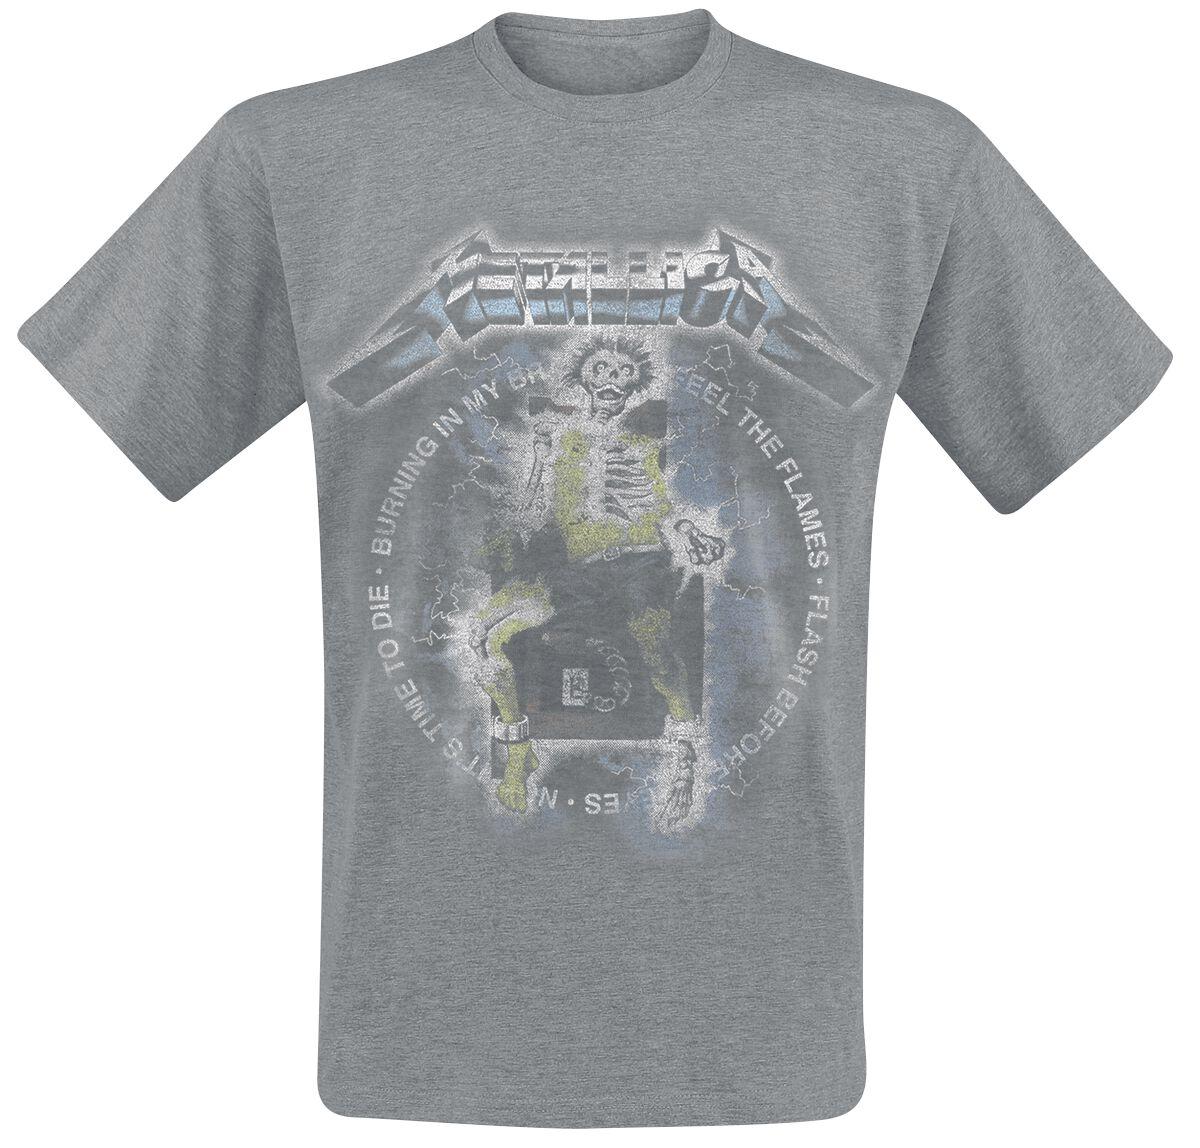 de94e1cd6 Soul Rebel Nyc T Shirt   Whole